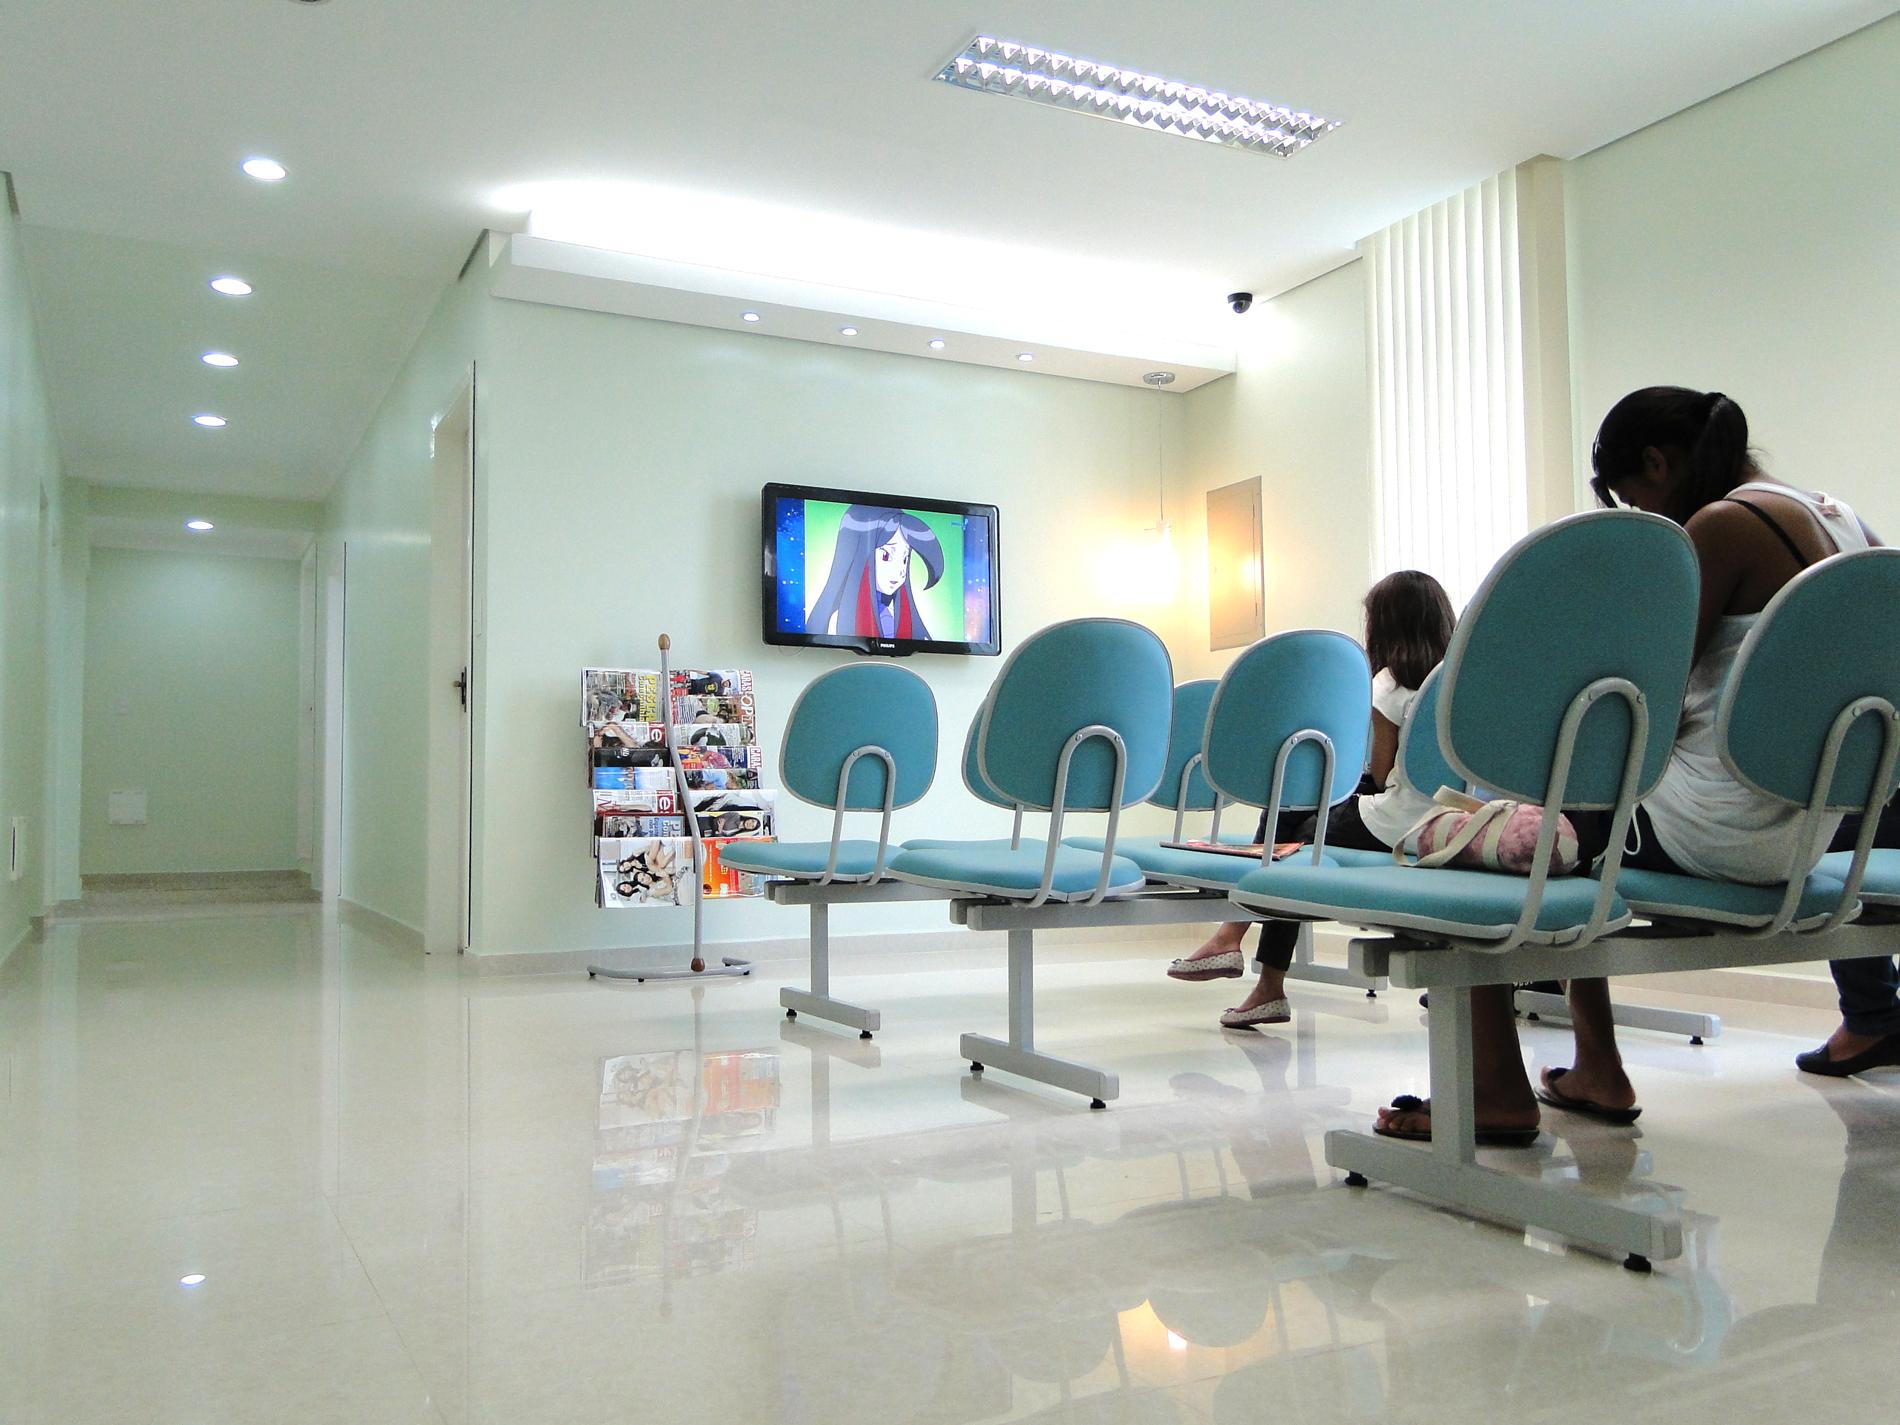 ageclin-odonto-center-sala-de-espera